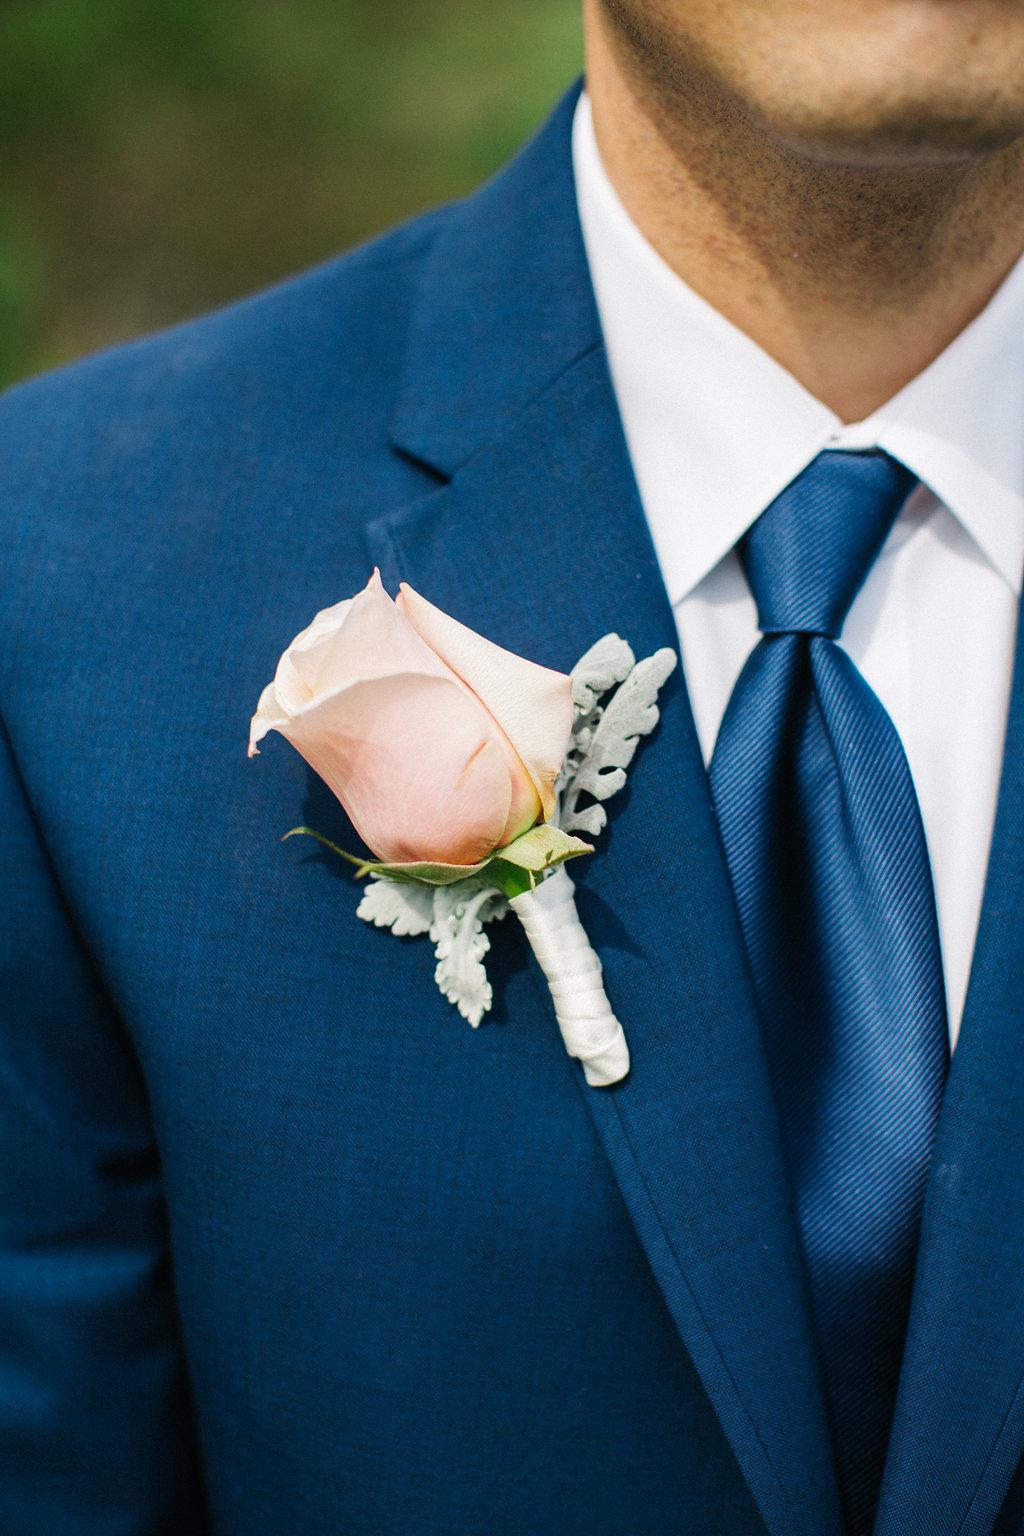 winey-blonde-vineyard-wedding-ideas (8).jpg